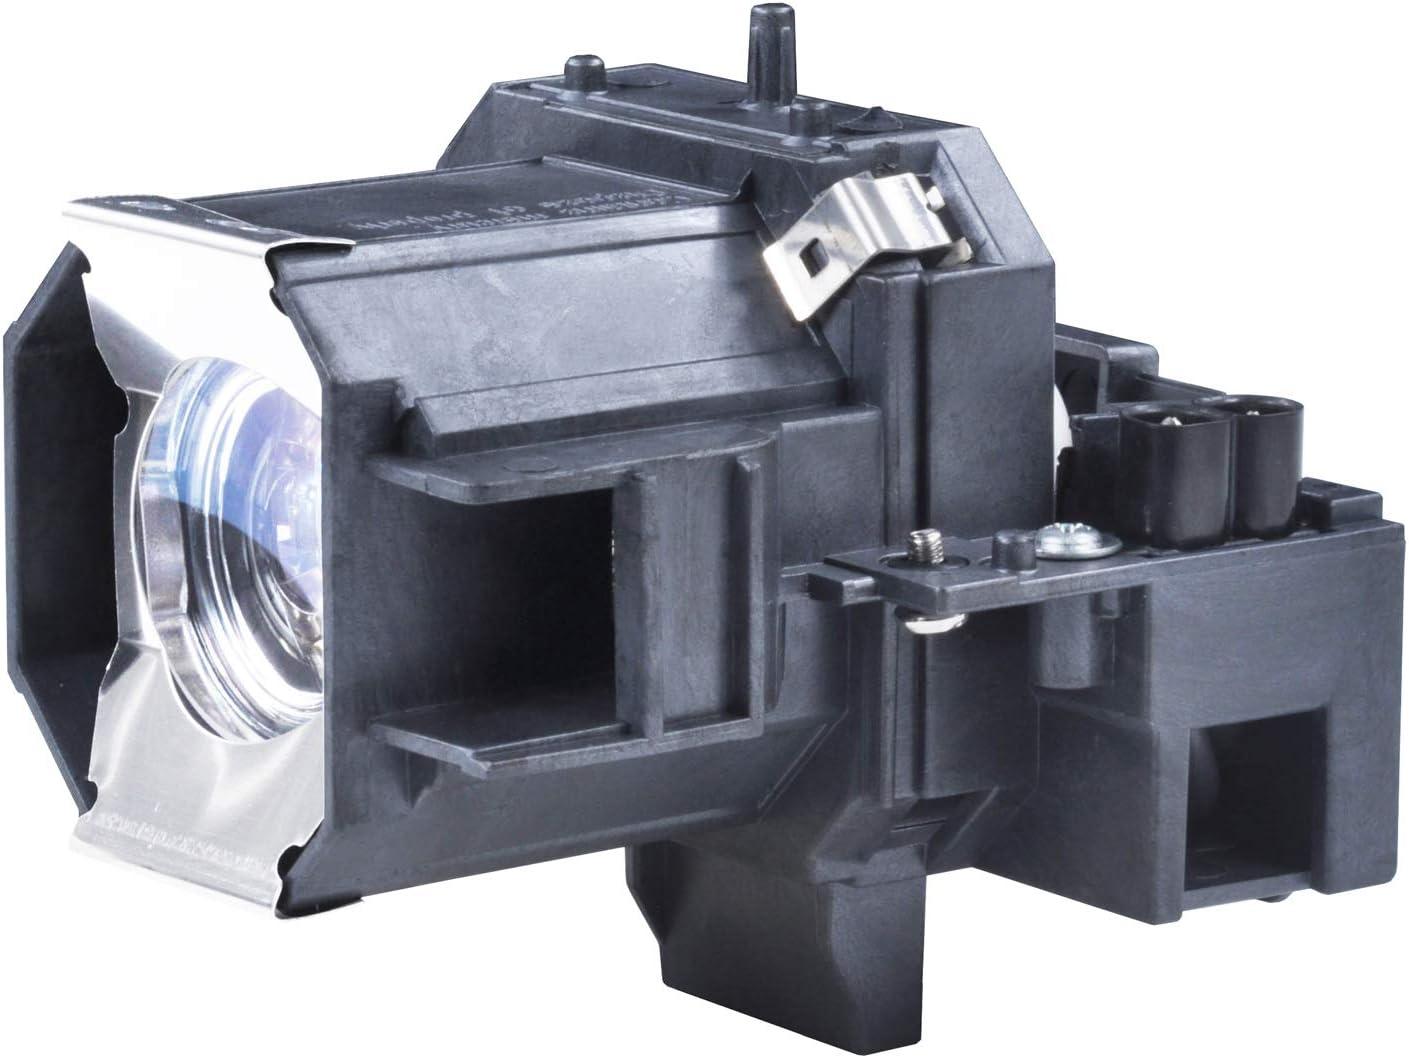 for Epson ELPLP39,V13H010L39, V13h010l39 Projector Lamp,Powerlite Home Cinema 1080ub Bulb by Molgoc